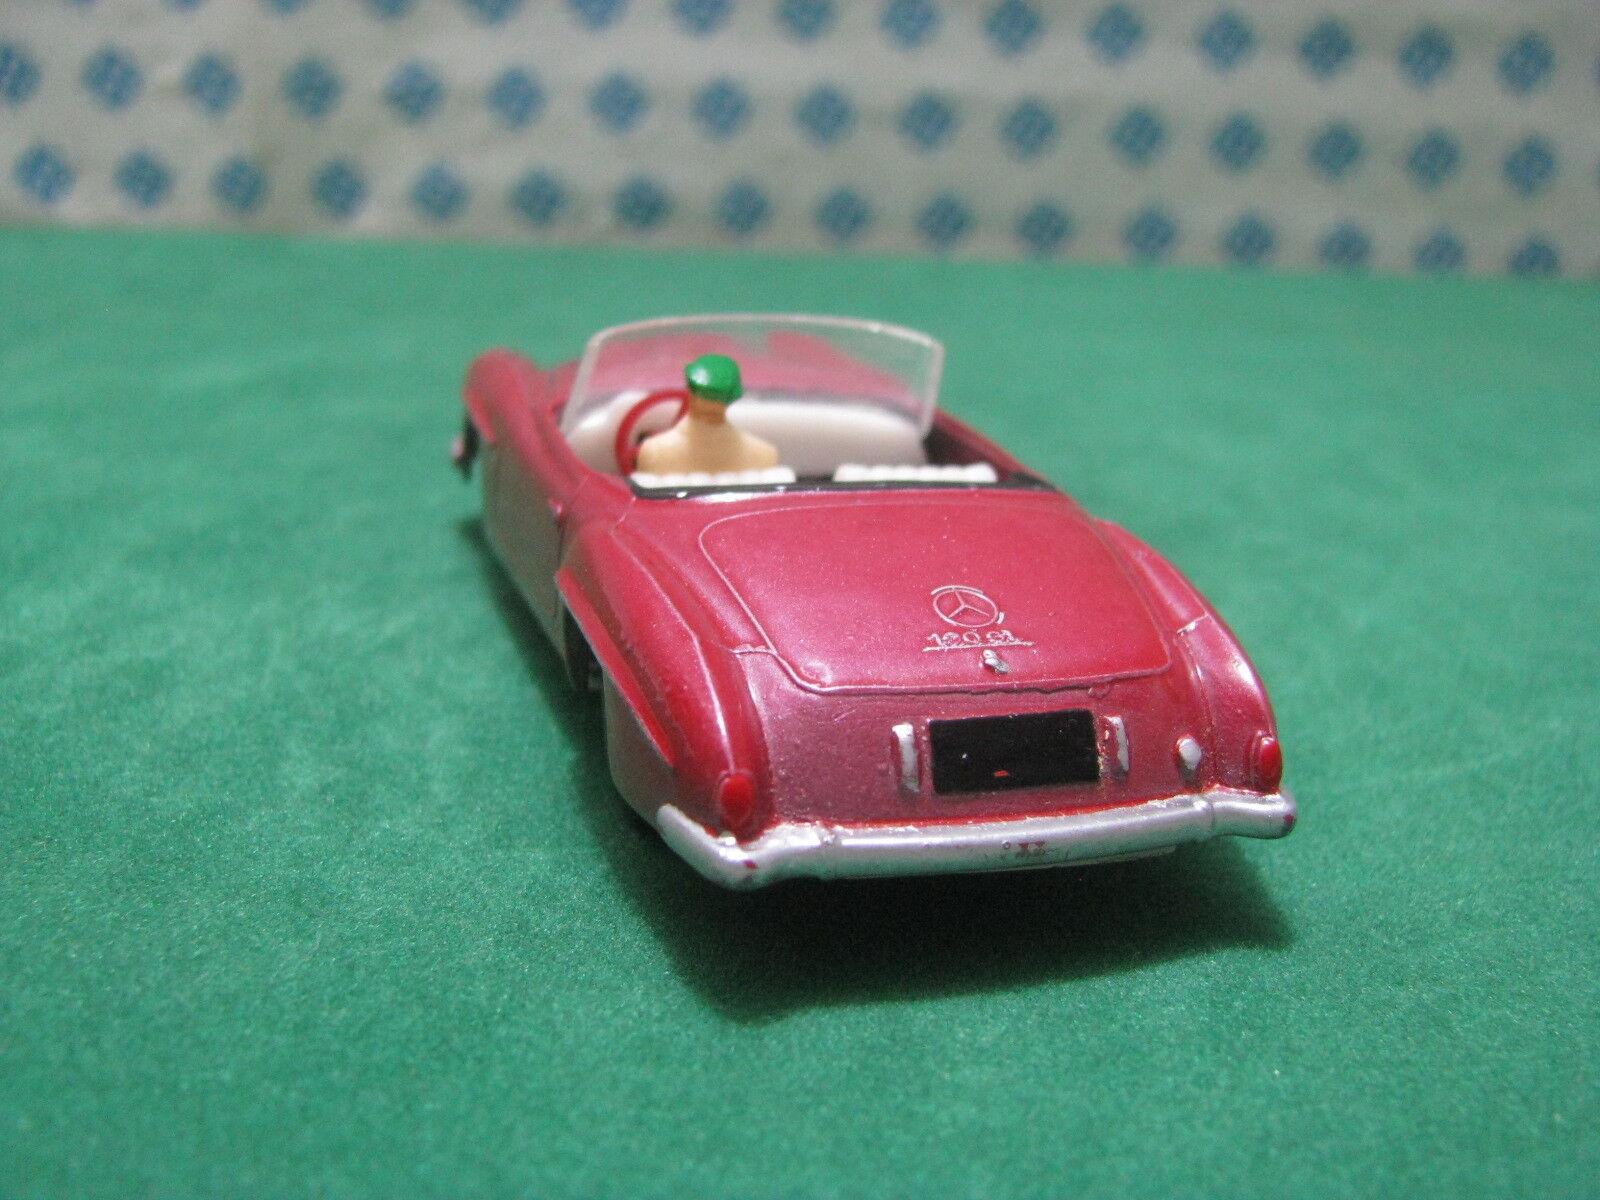 Vintage - Mercedes-Benz 190 Sl - 1 43 Solido Ref. Ref. Ref. 125 Série 100 bc1df5